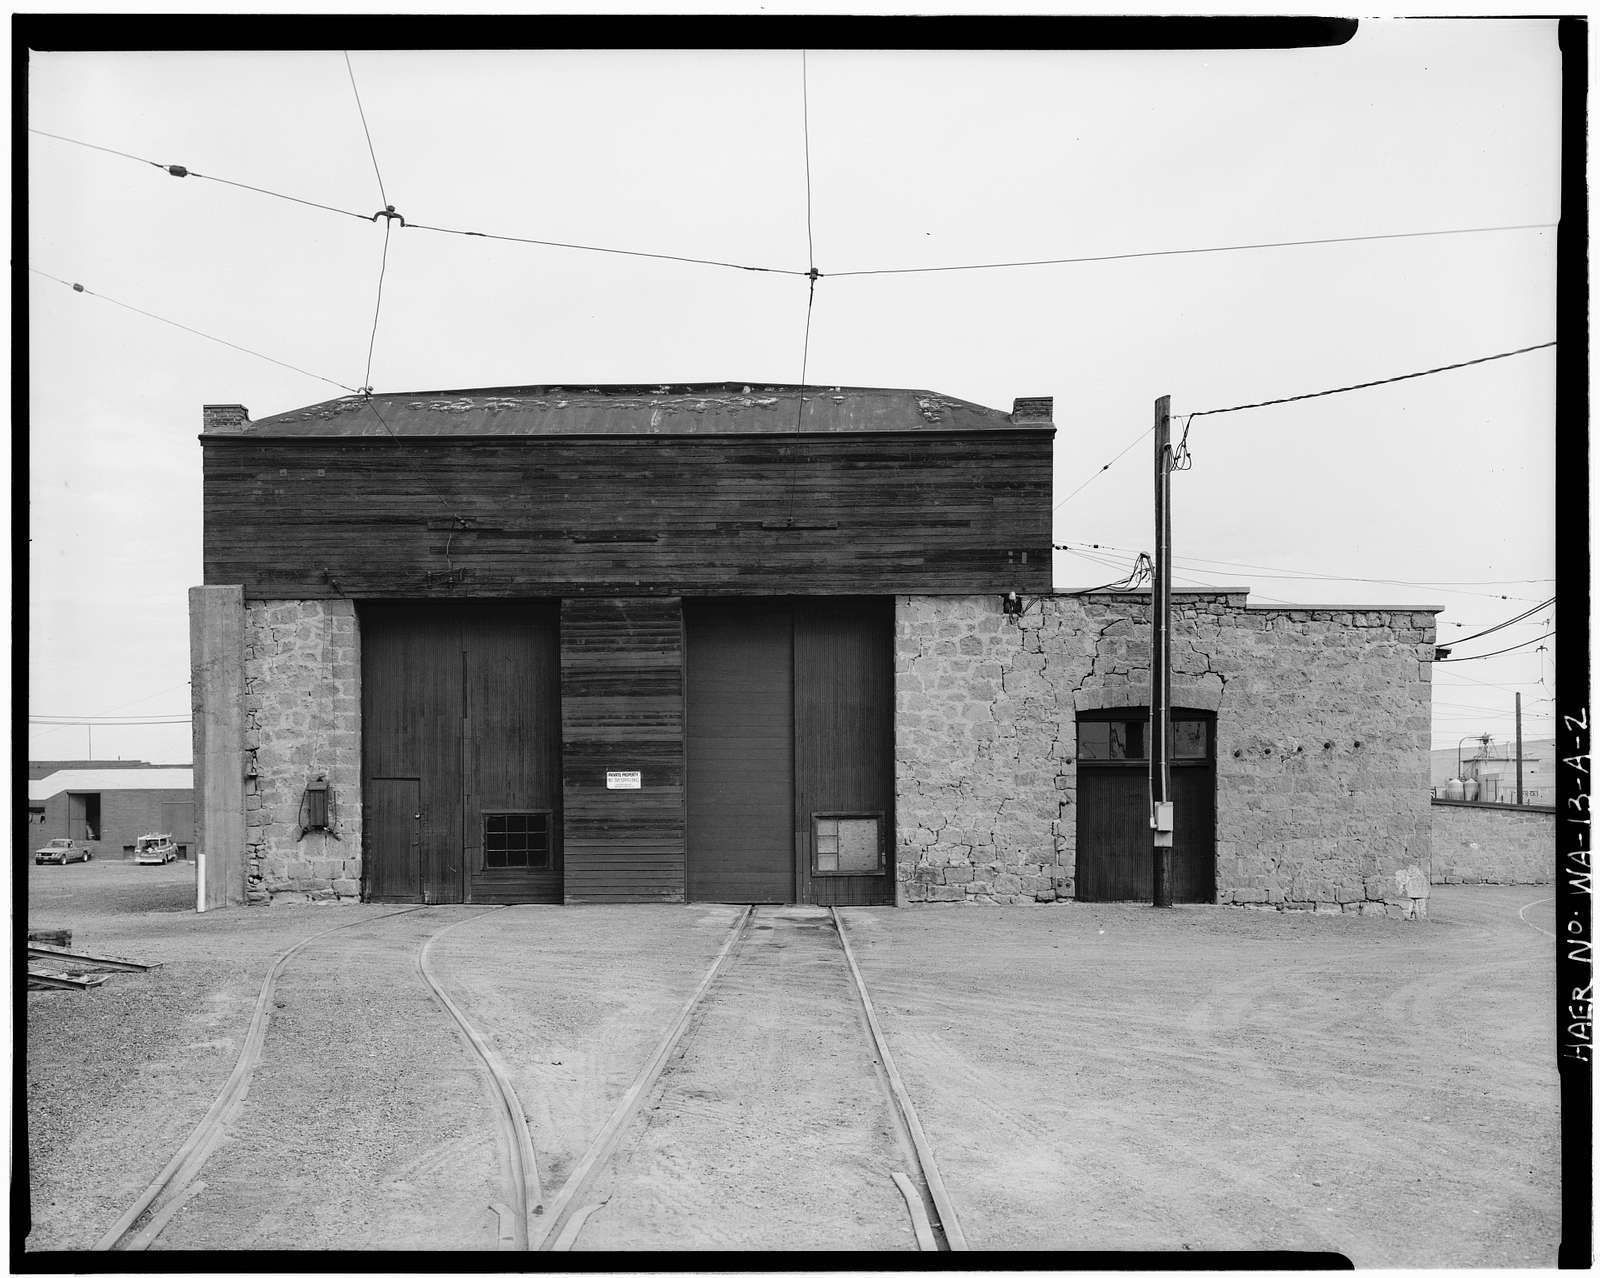 Yakima Valley Transportation Company Interurban Railroad, Carbarn, Third Avenue & Pine Street, Yakima, Yakima County, WA